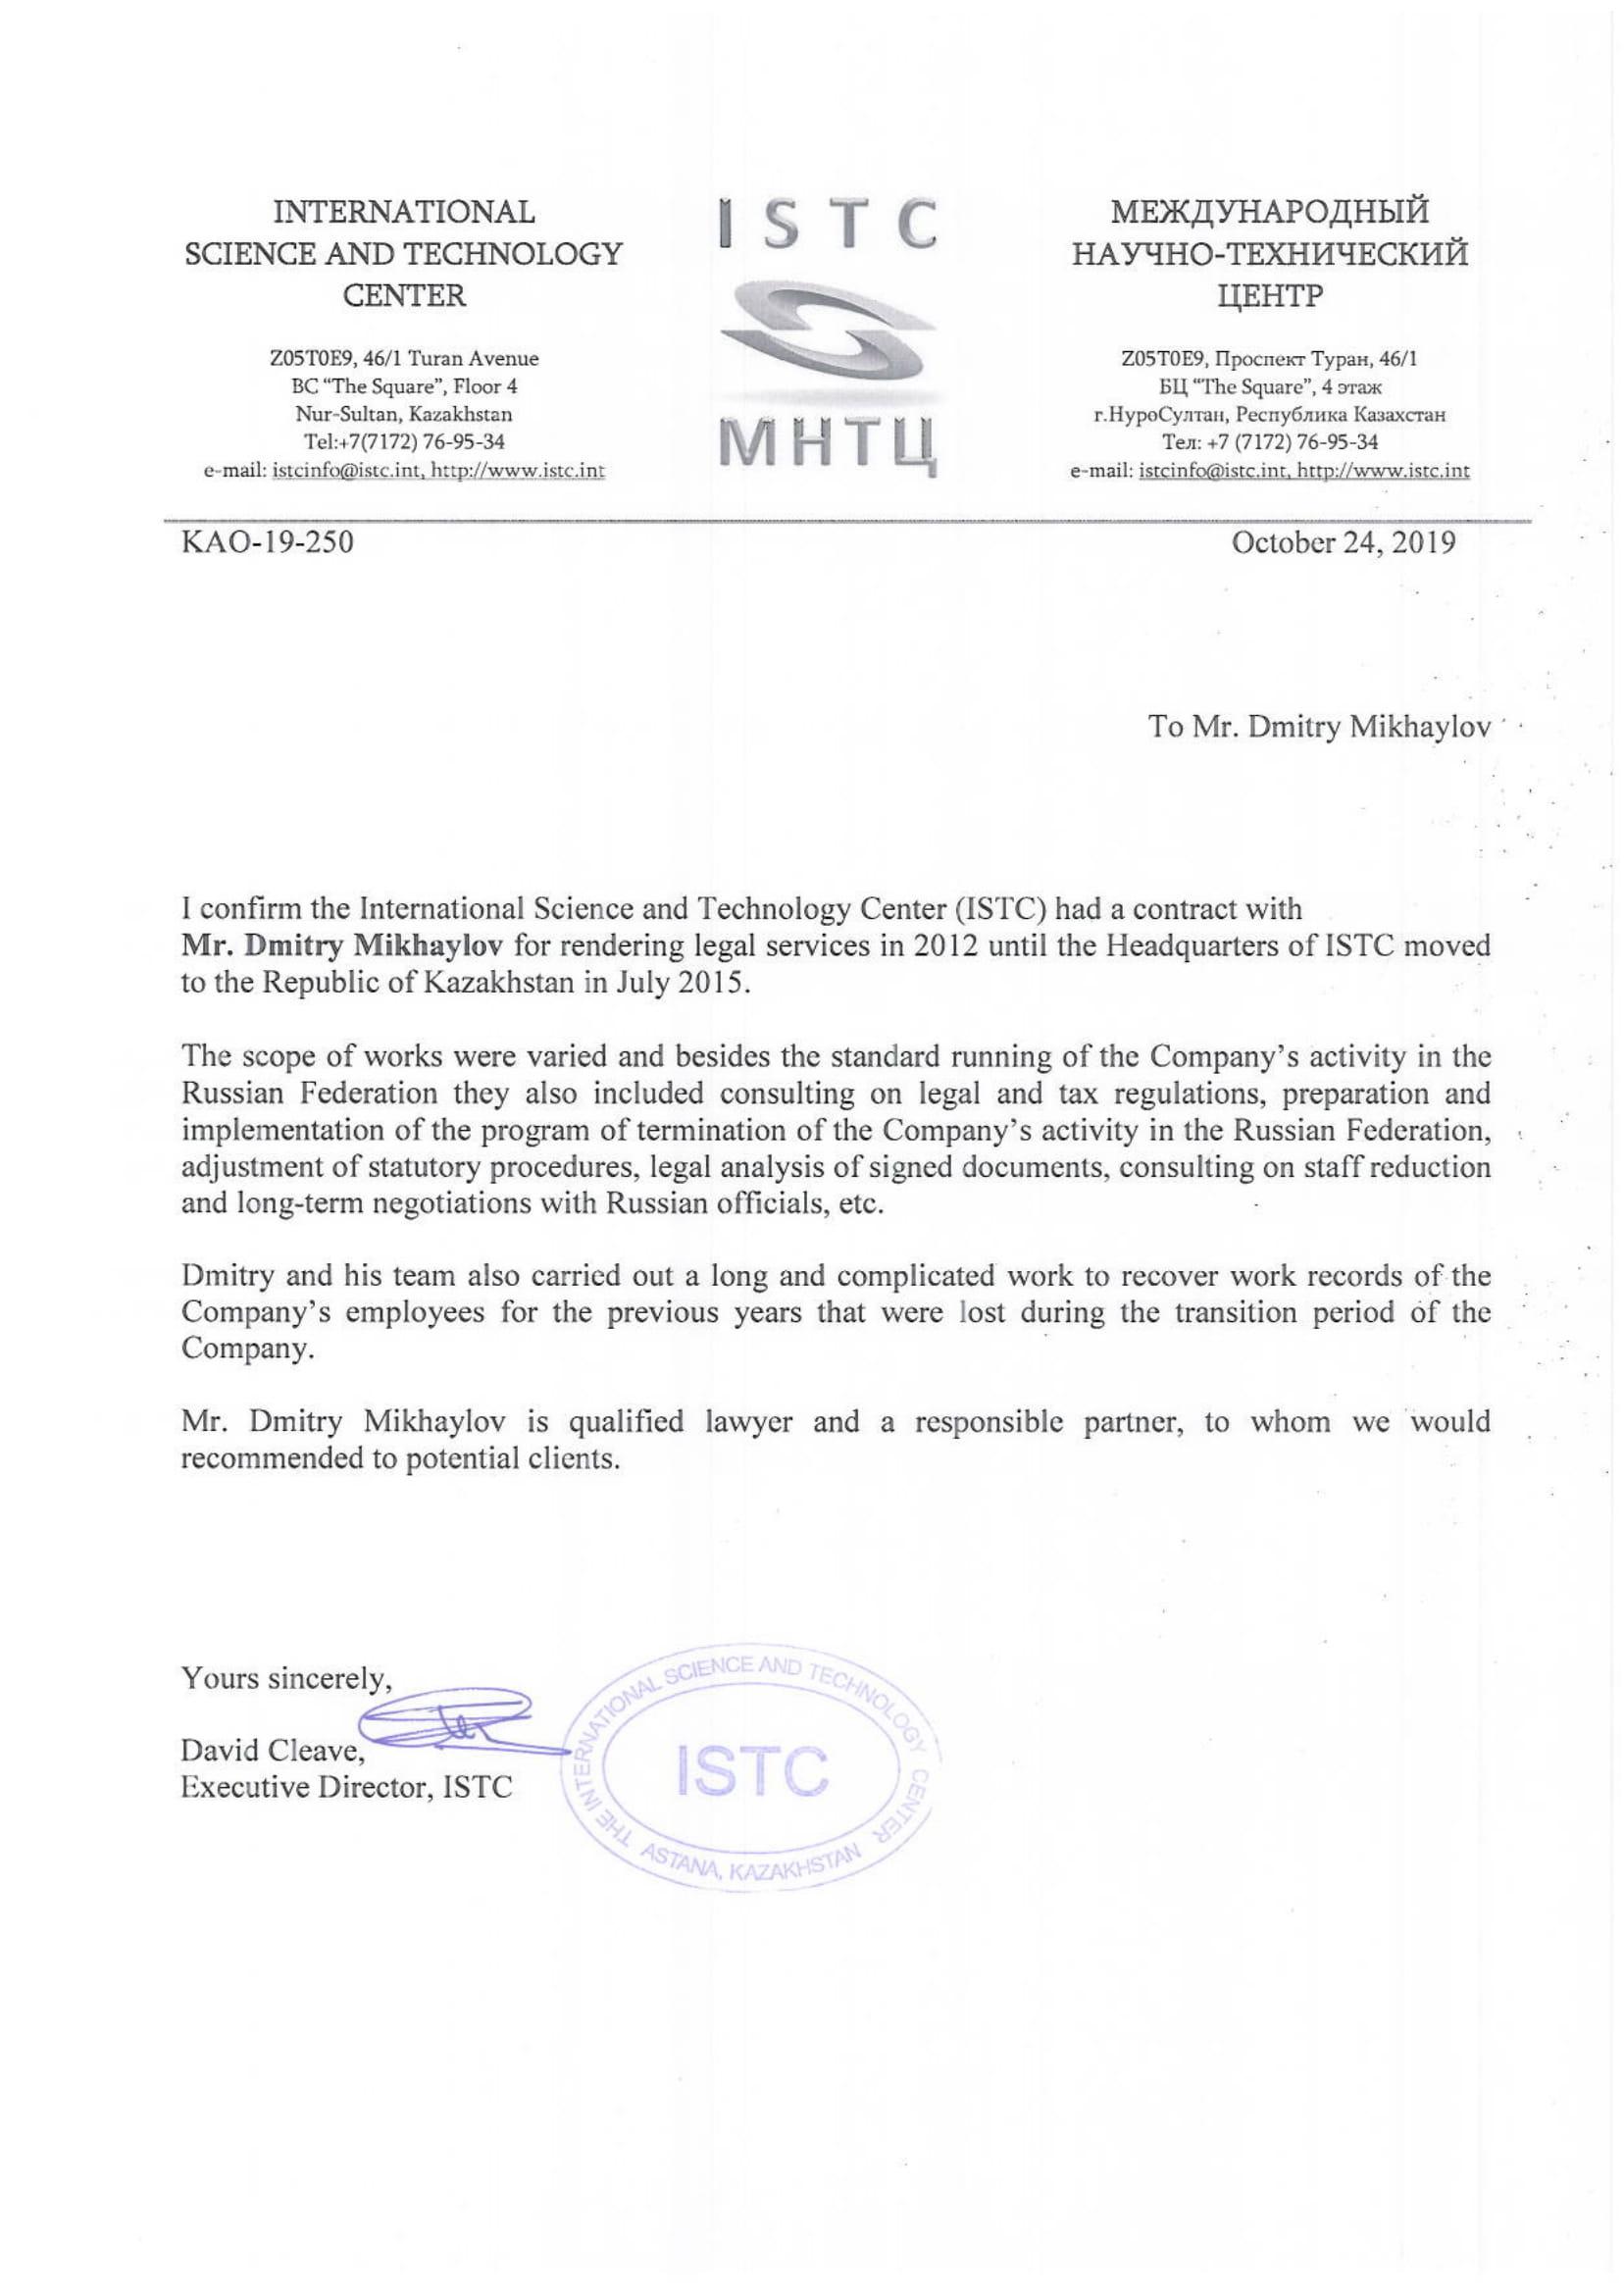 ISTC_signed